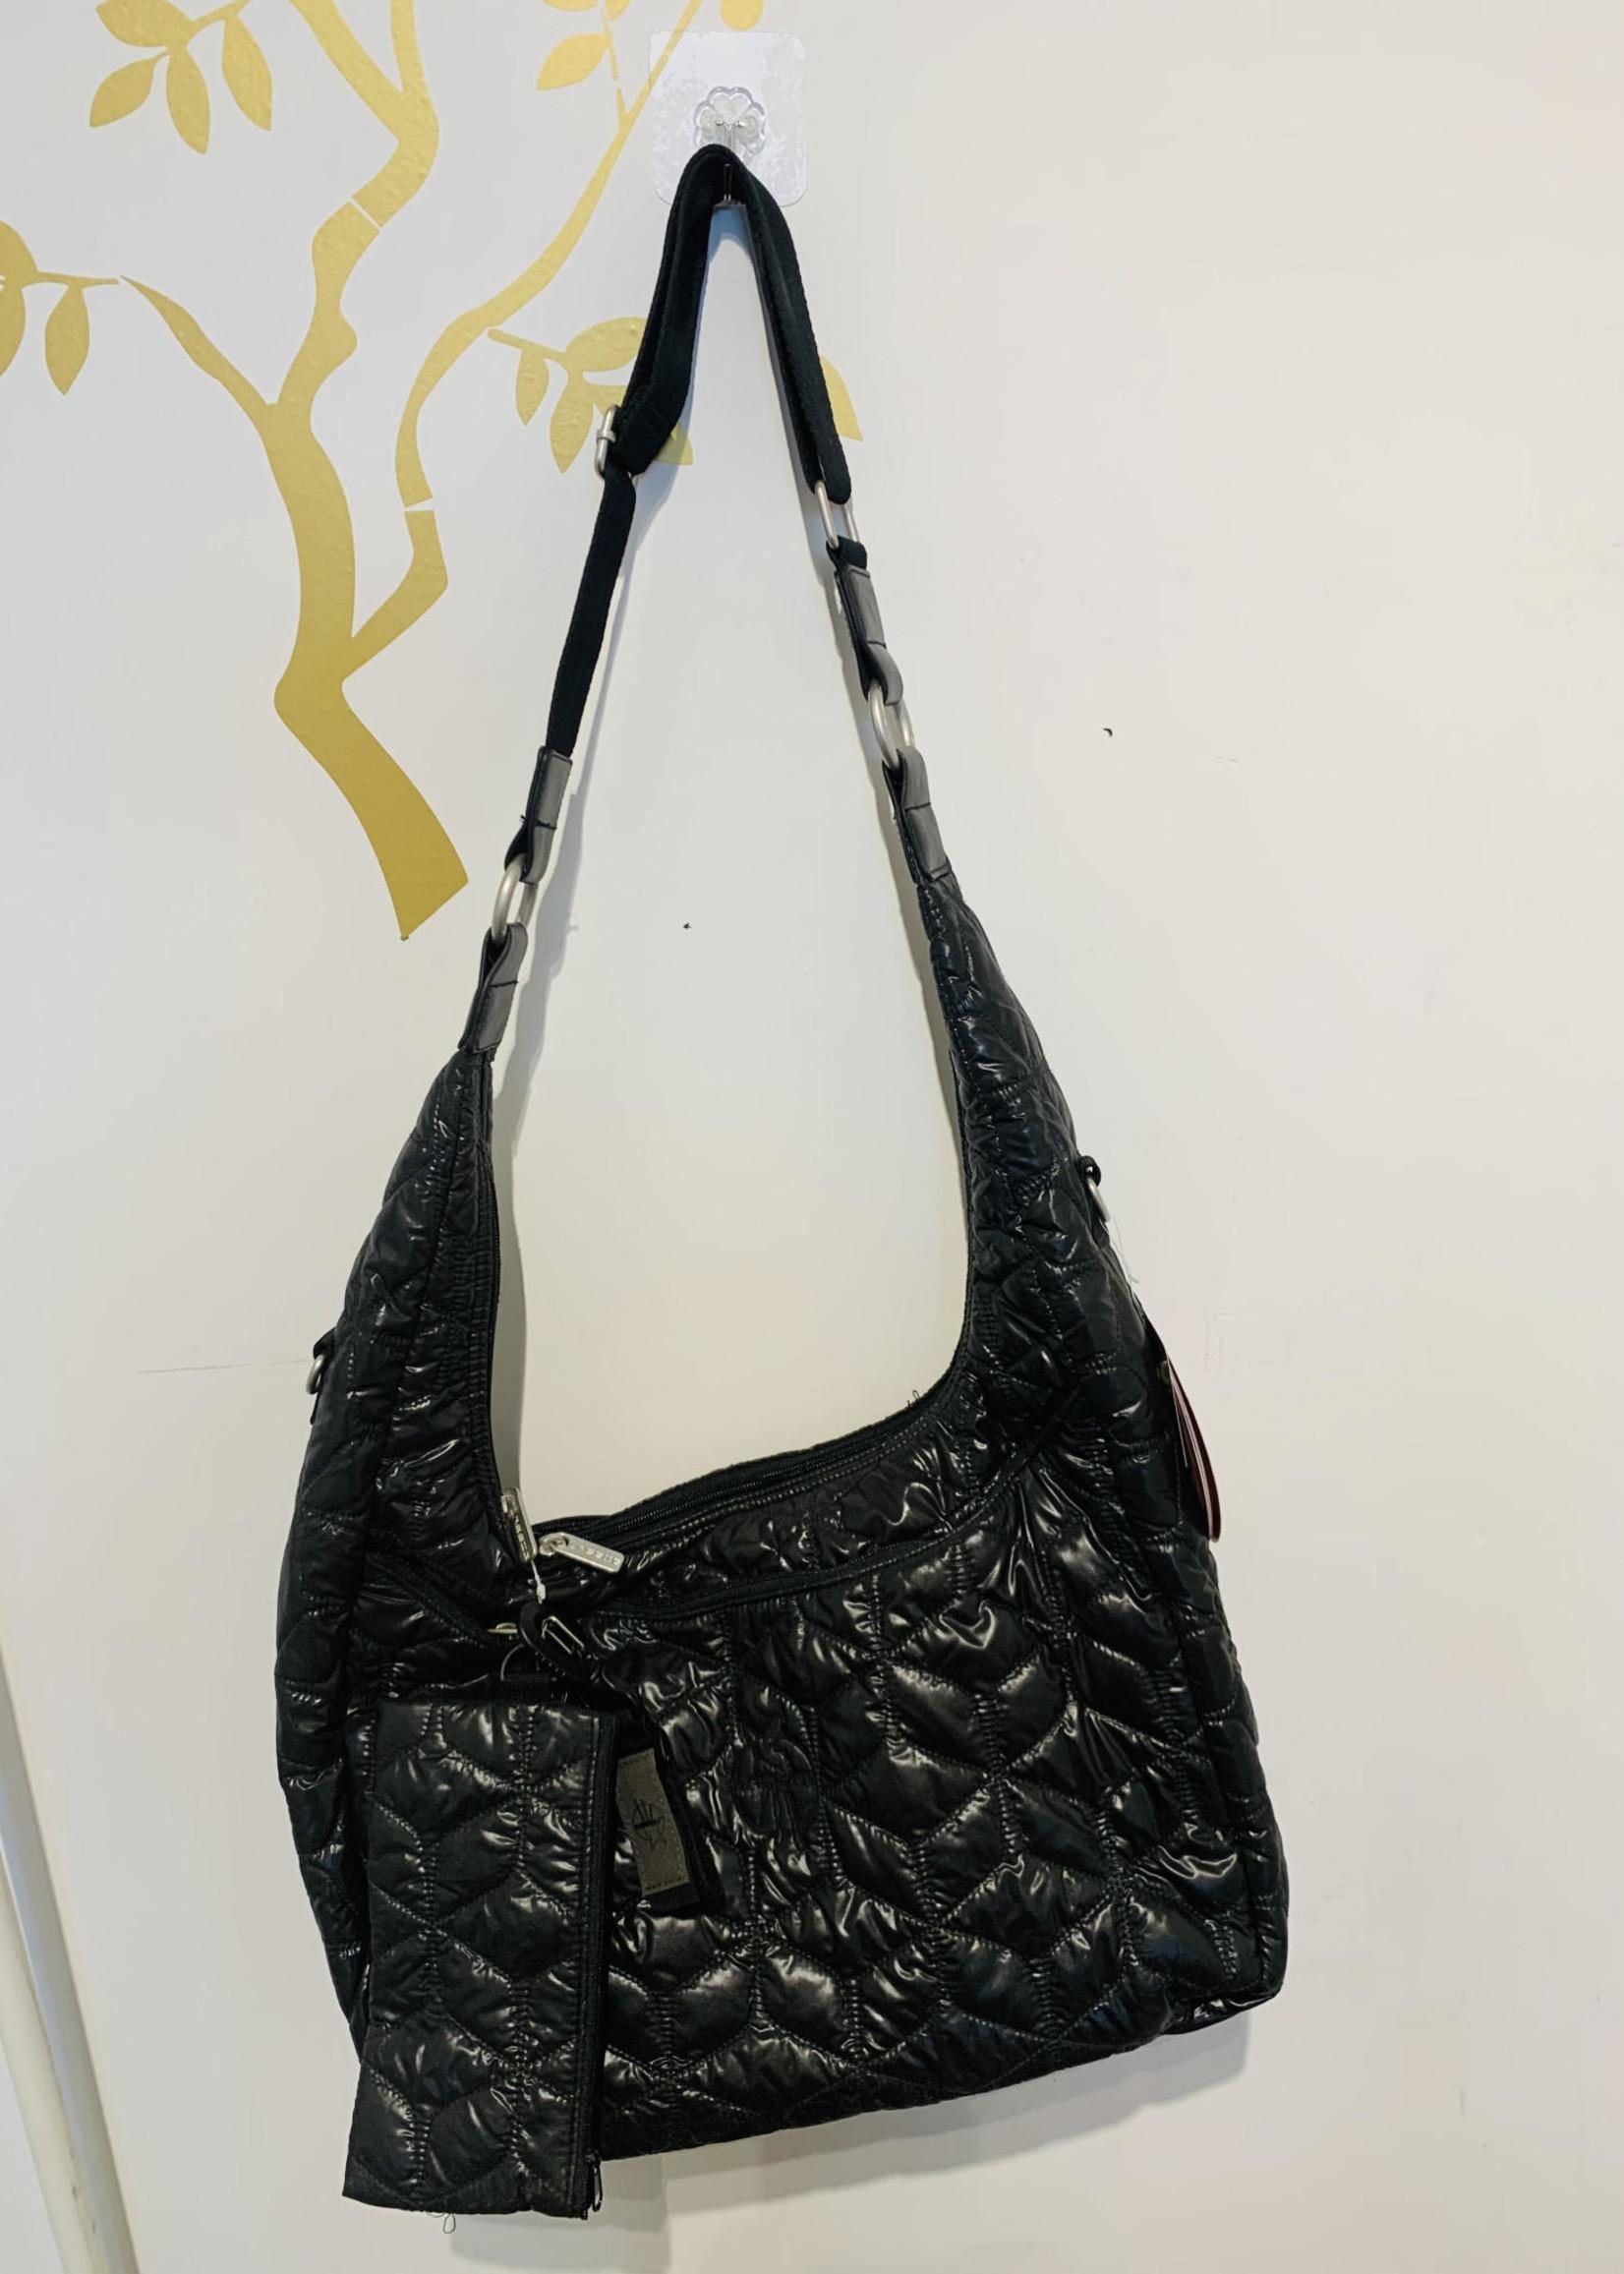 lassig Lassig Glam Banana Diaper Bag (Black)